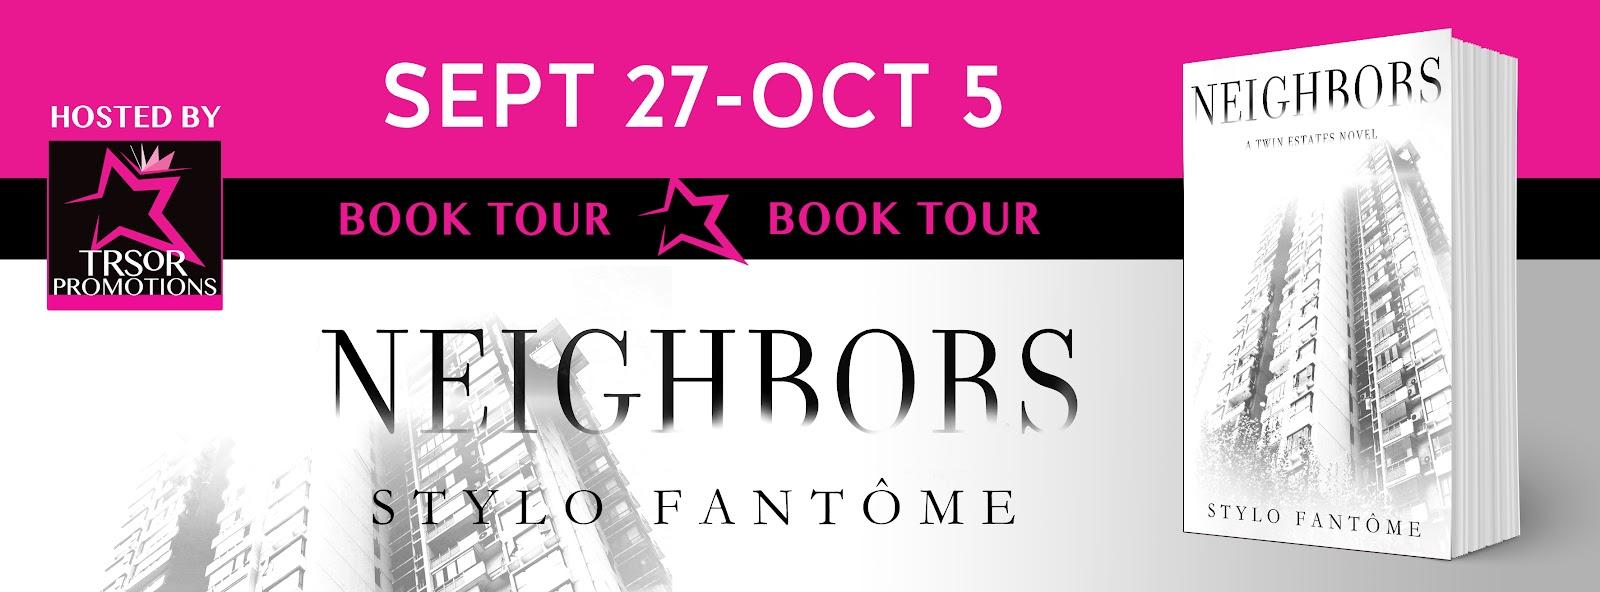 NIGHBORS_BOOK_TOUR.jpg